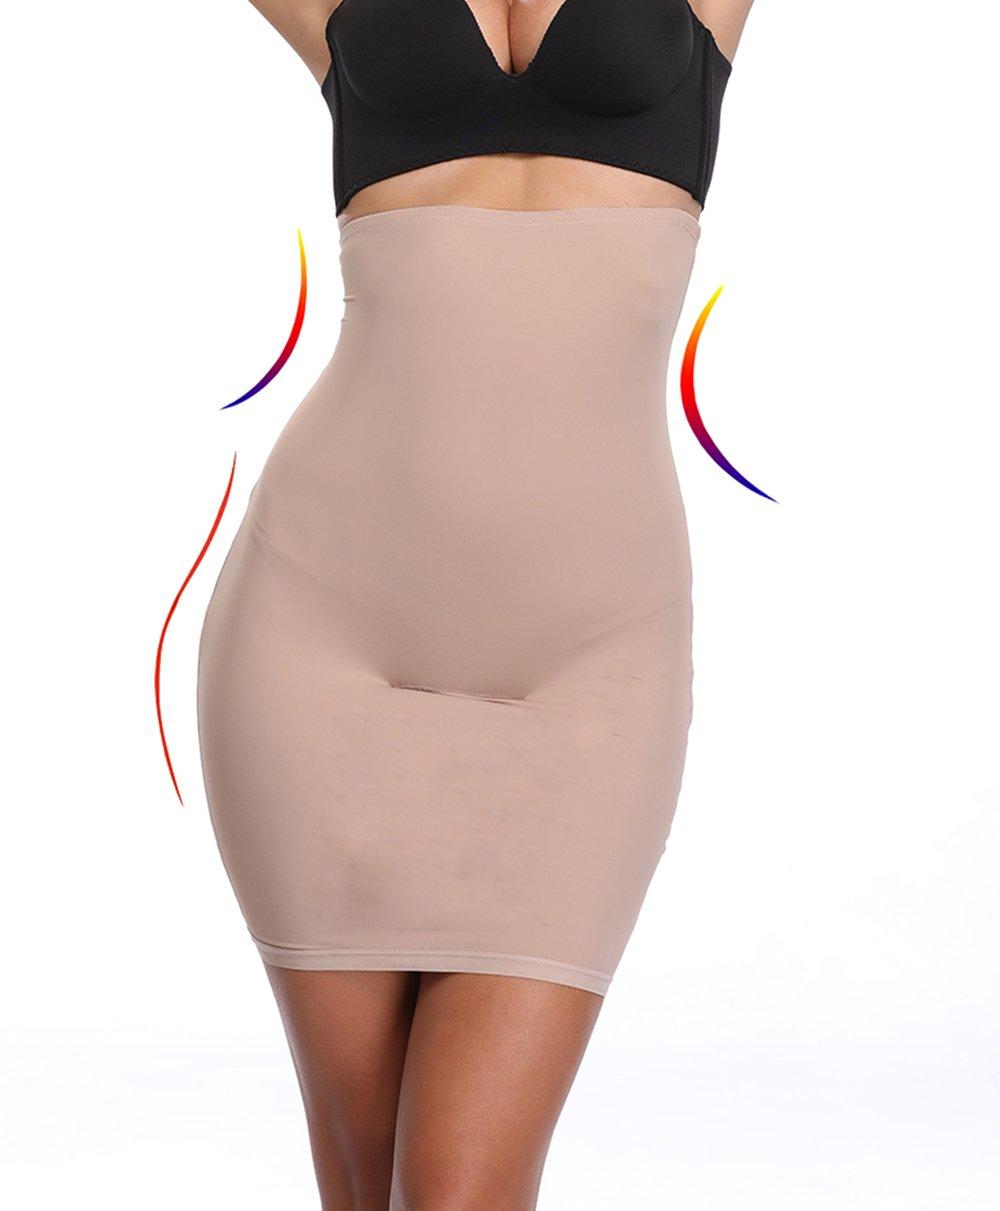 Half Slips for Women Under Dress Butt Lift Shapewear Tummy Control Waist Trainer Body Shaper(Beige,L)